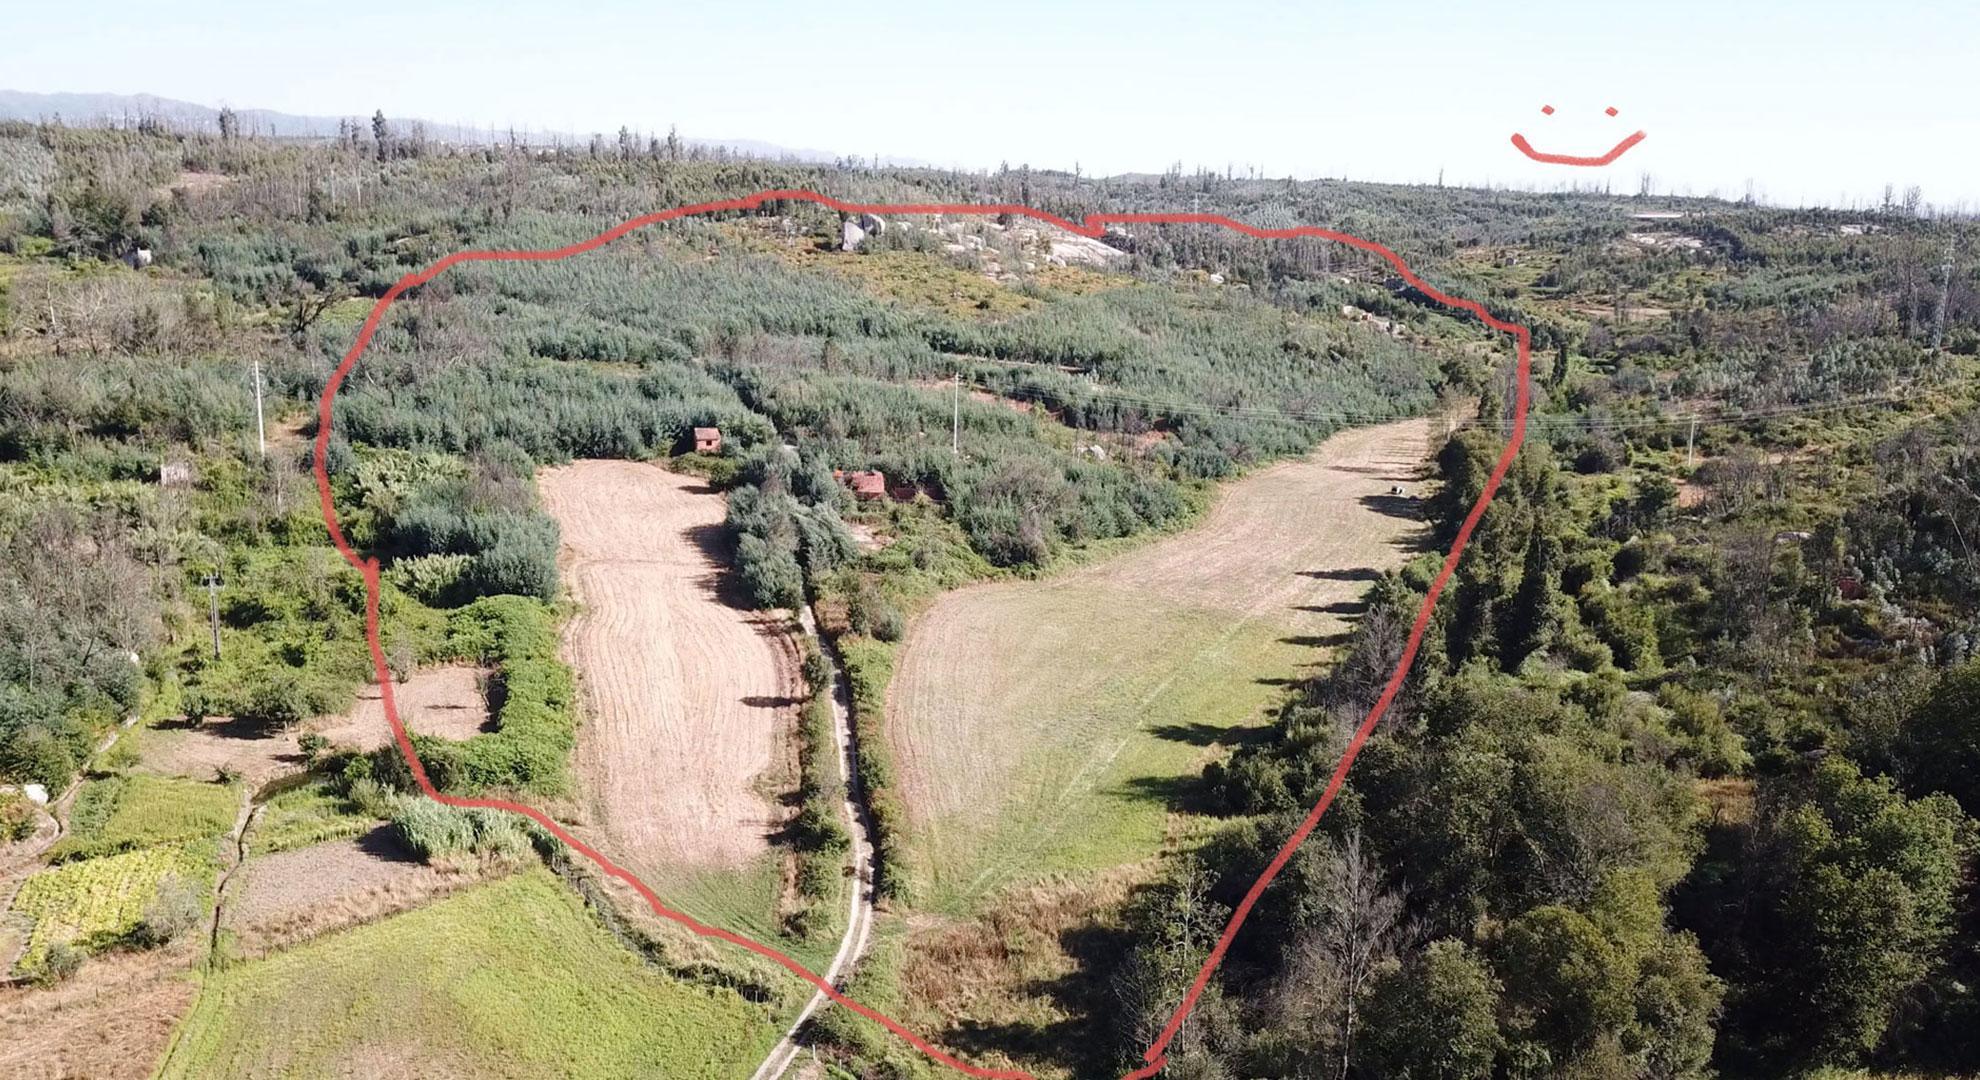 Birdview of project kamp land